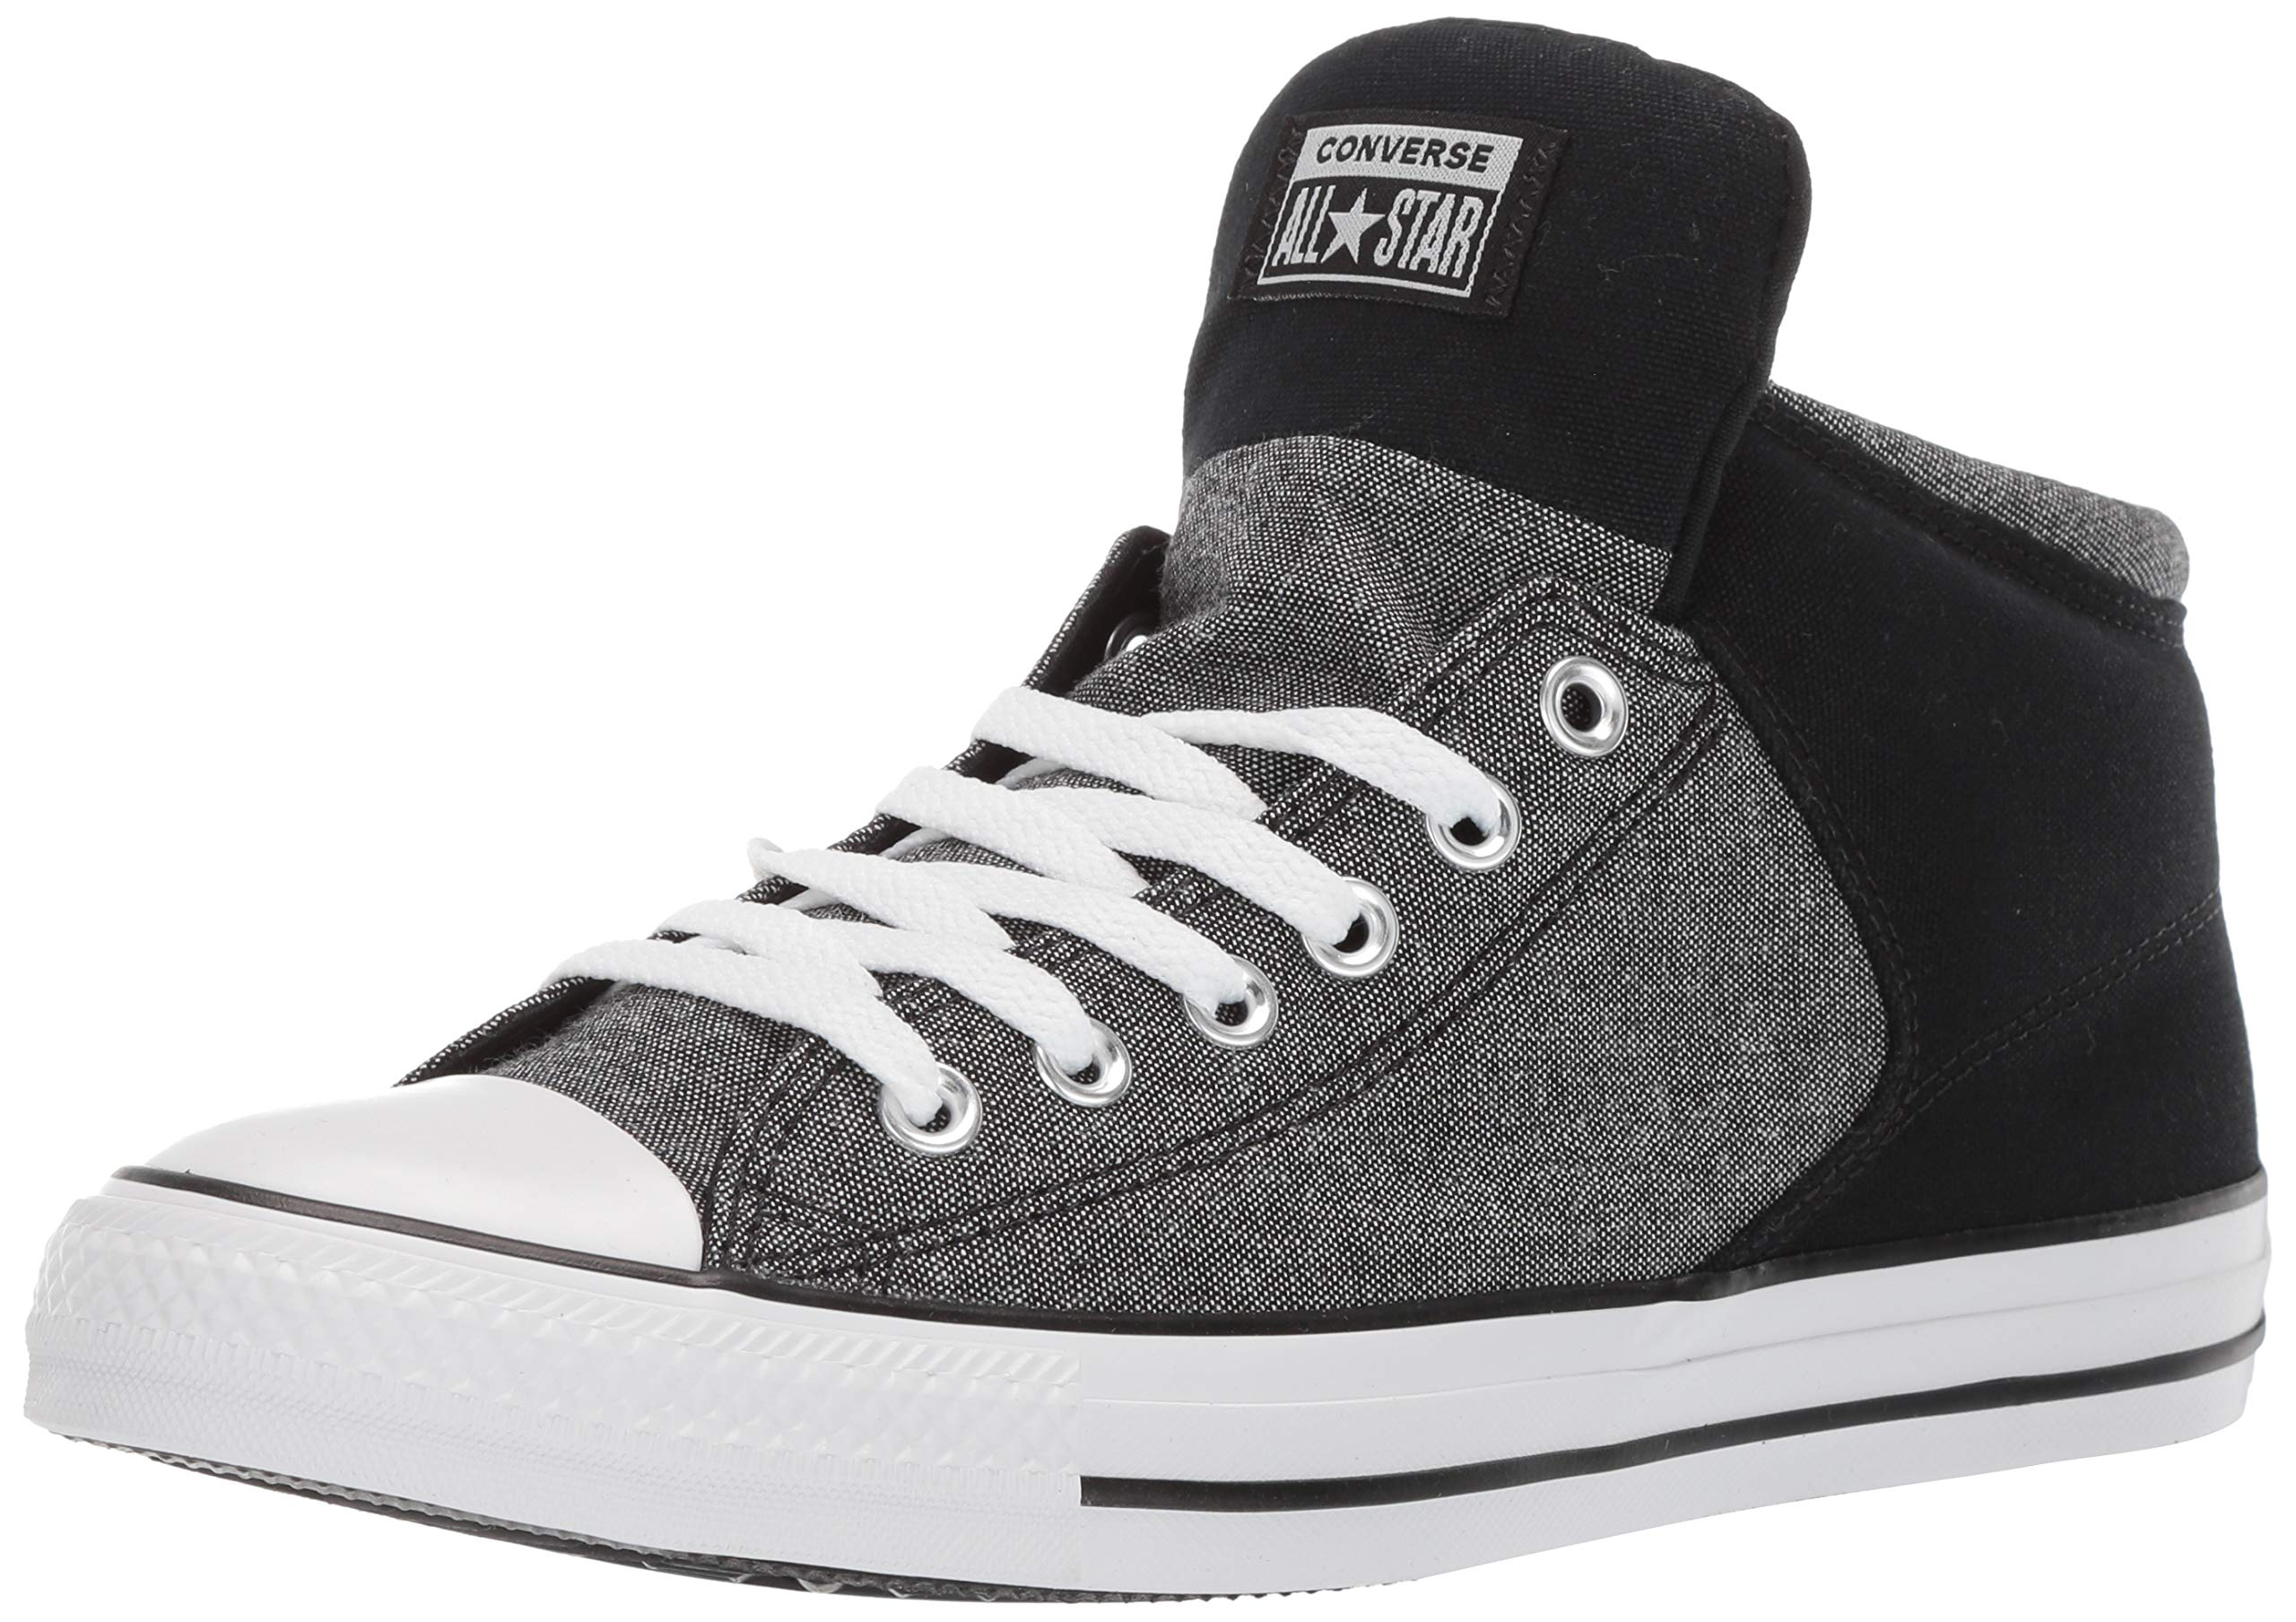 Converse Men's Unisex Chuck Taylor All Star Street High Top Sneaker WhiteBlackEnamel Red 12 M US